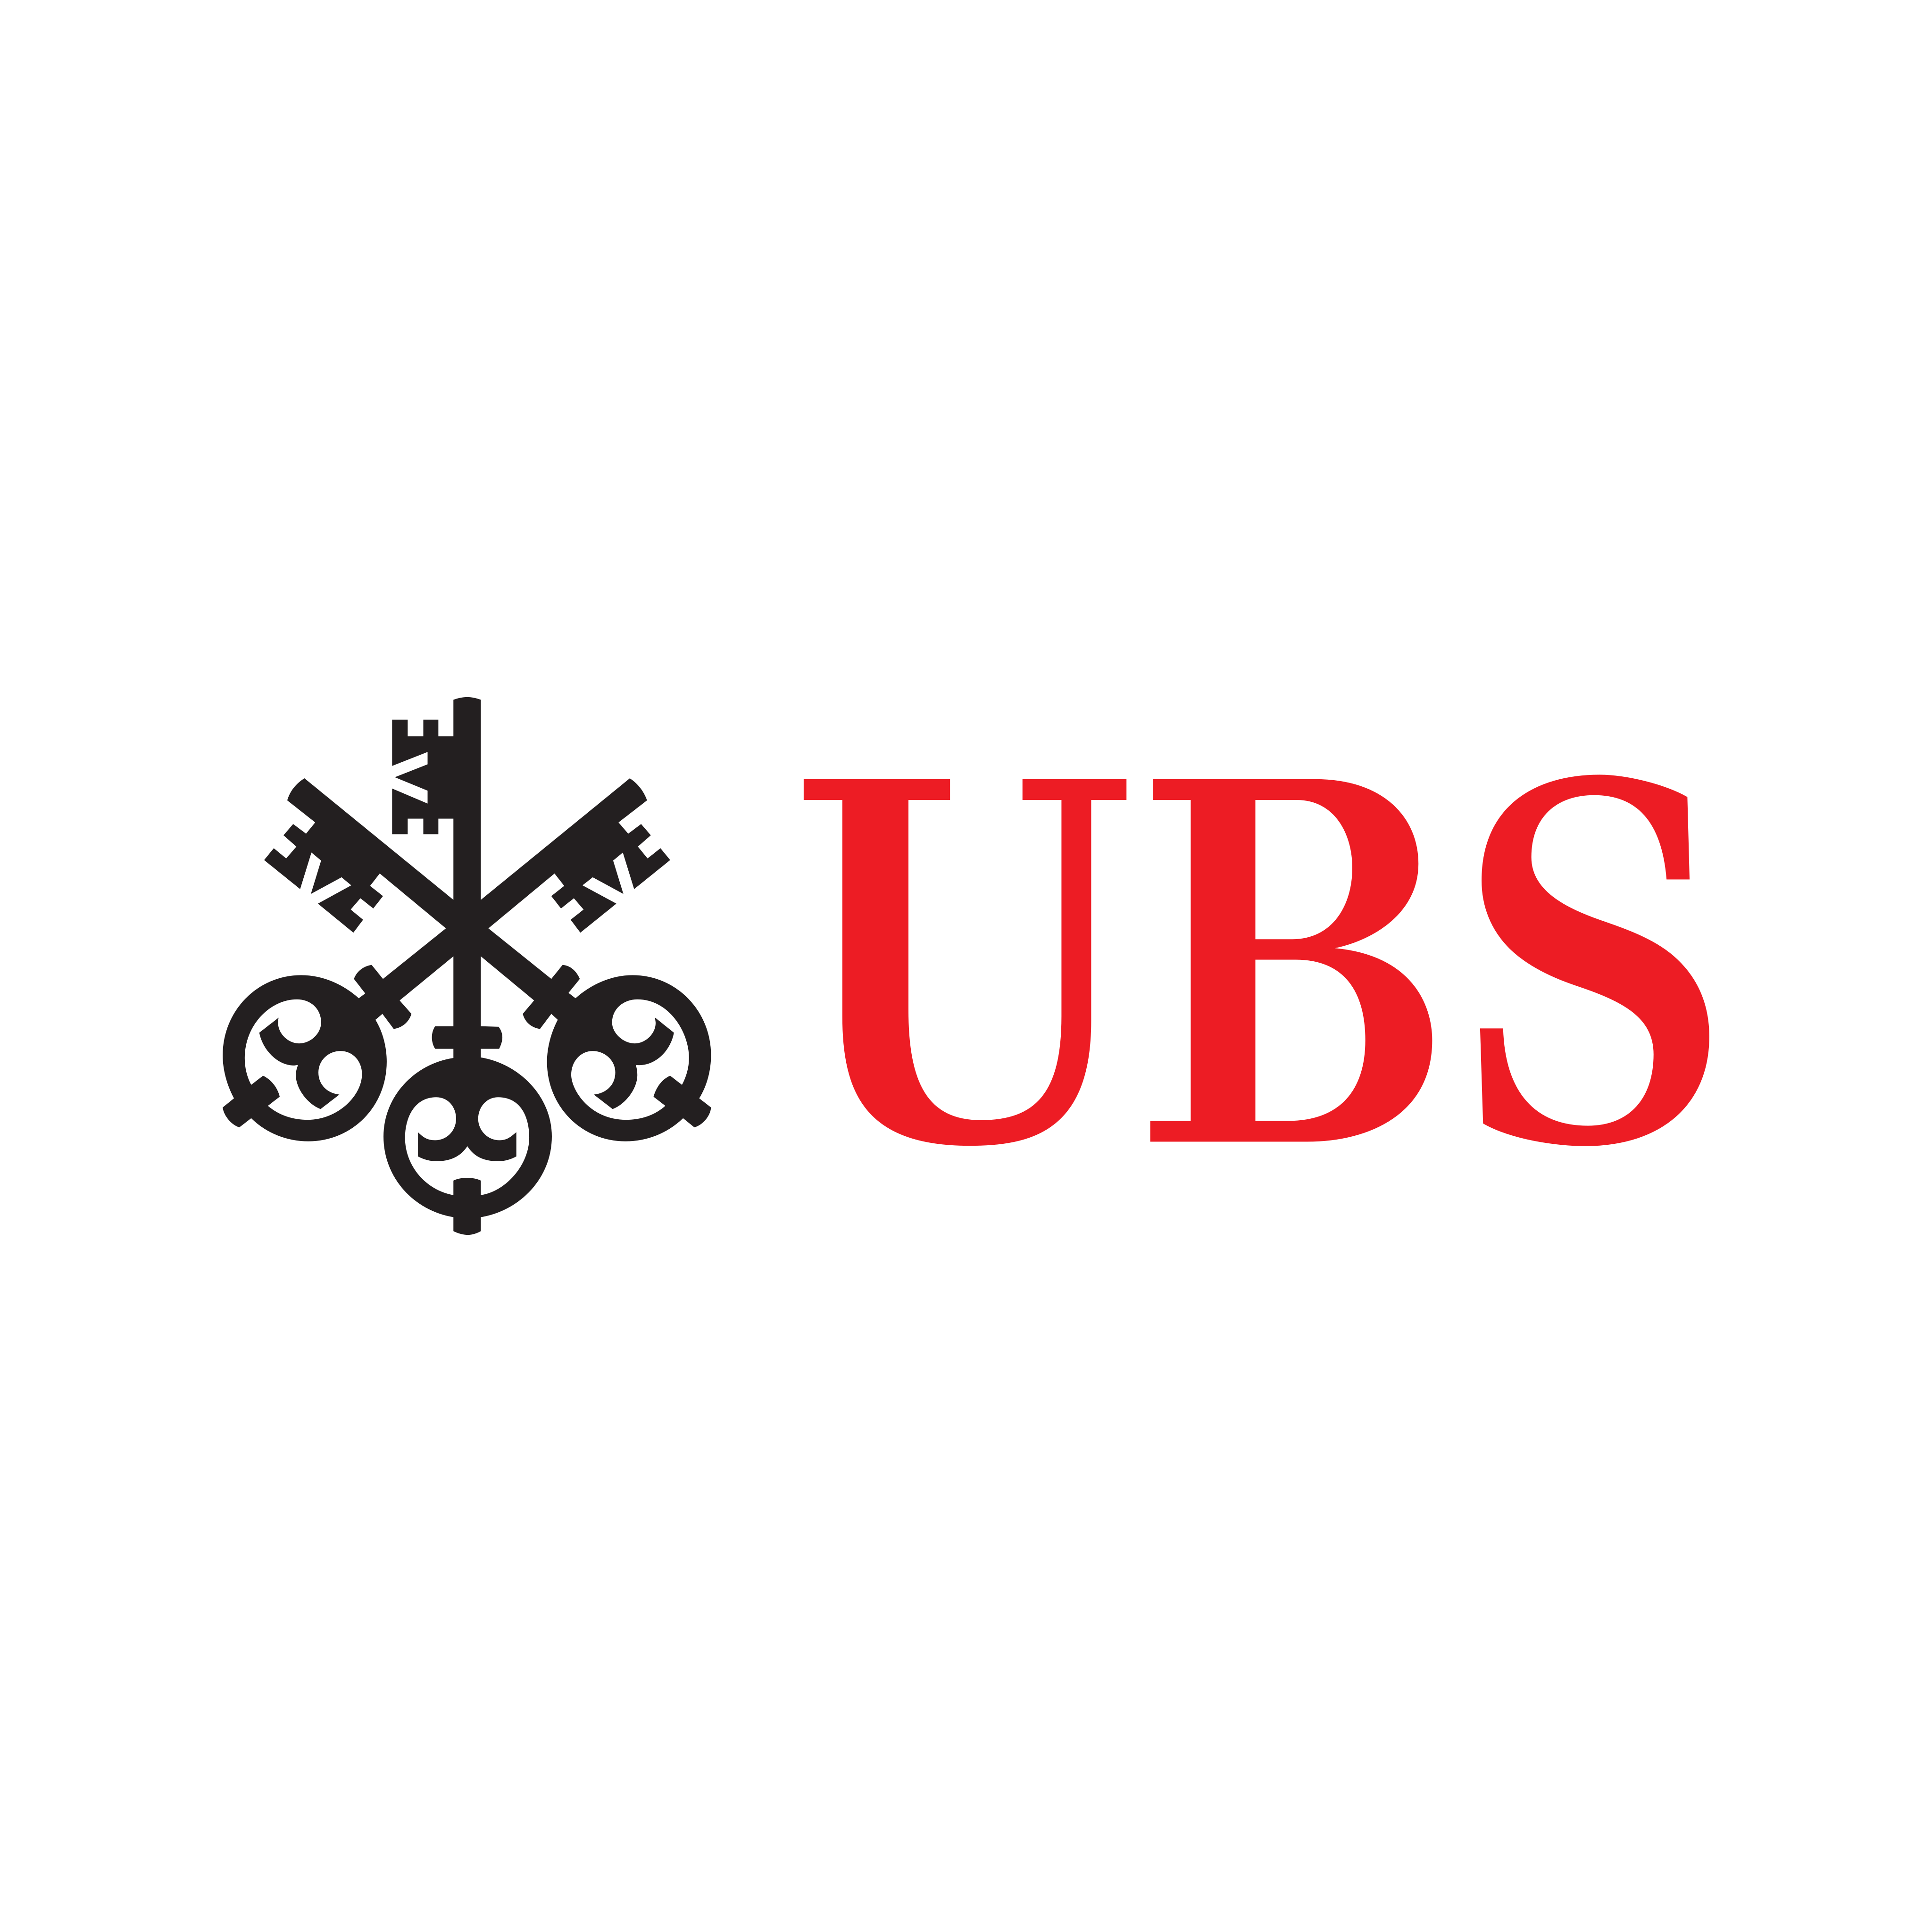 ubs logo 0 - UBS Logo